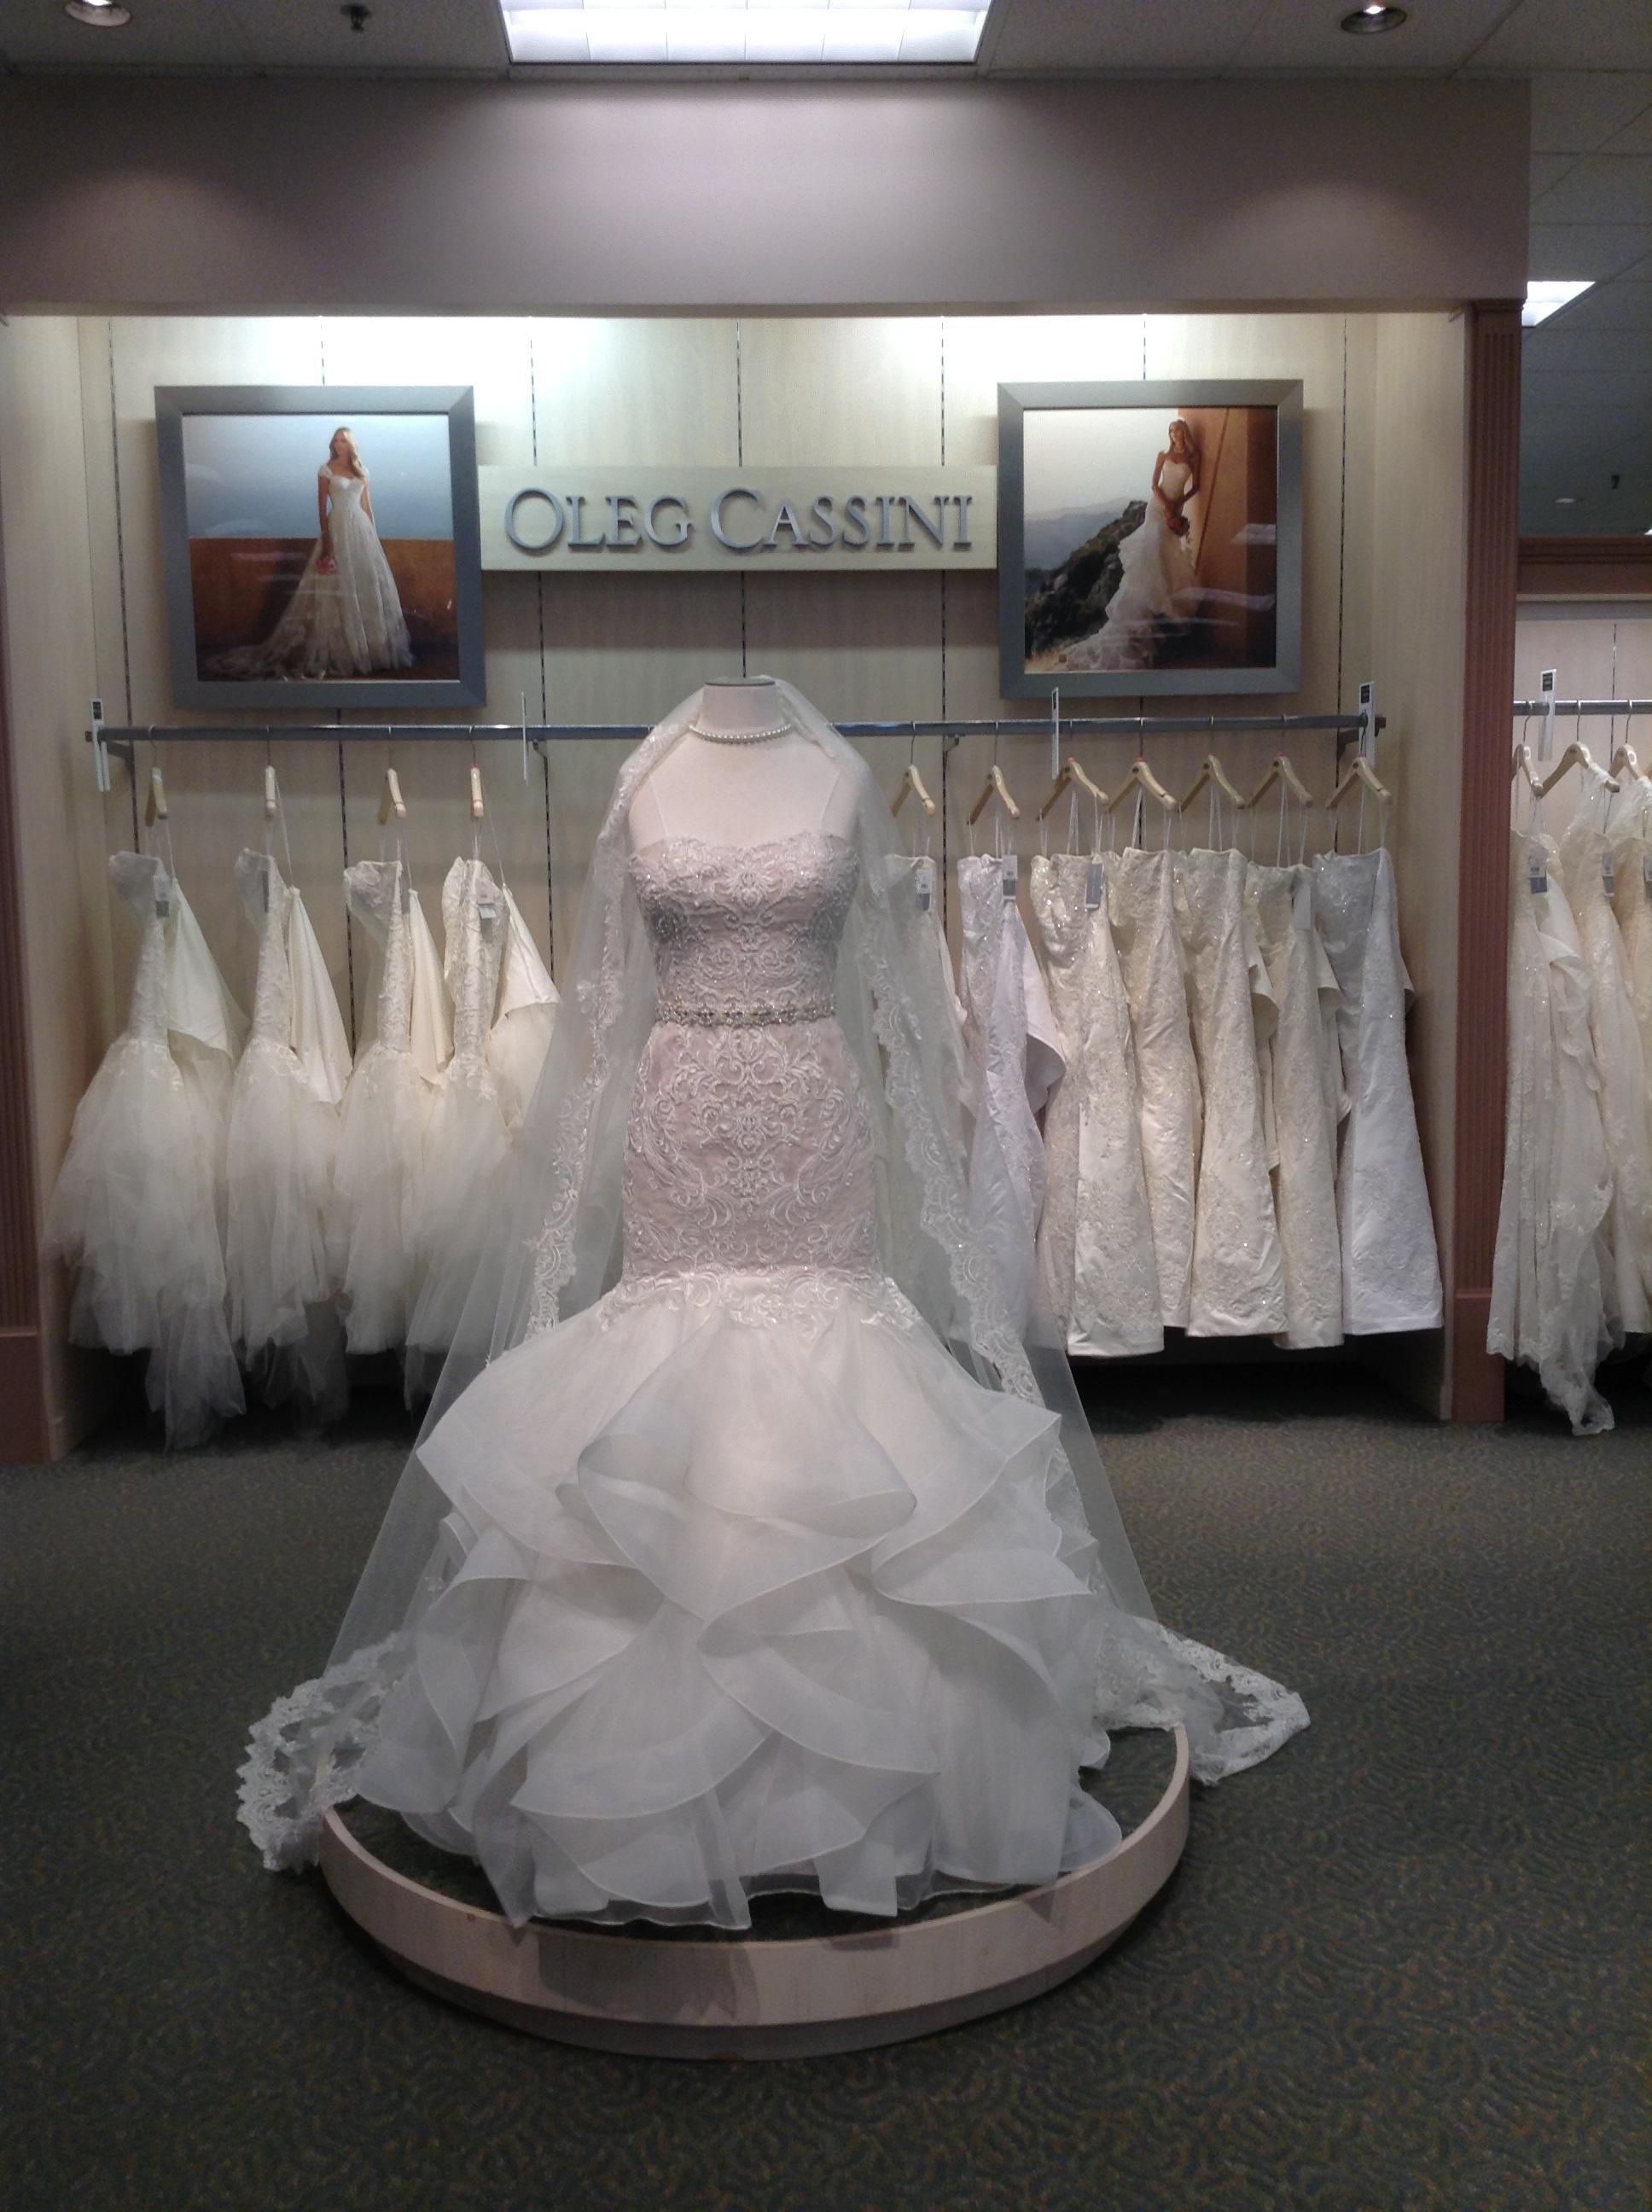 David S Bridal In Waco Tx 76711 Chamberofcommerce Com